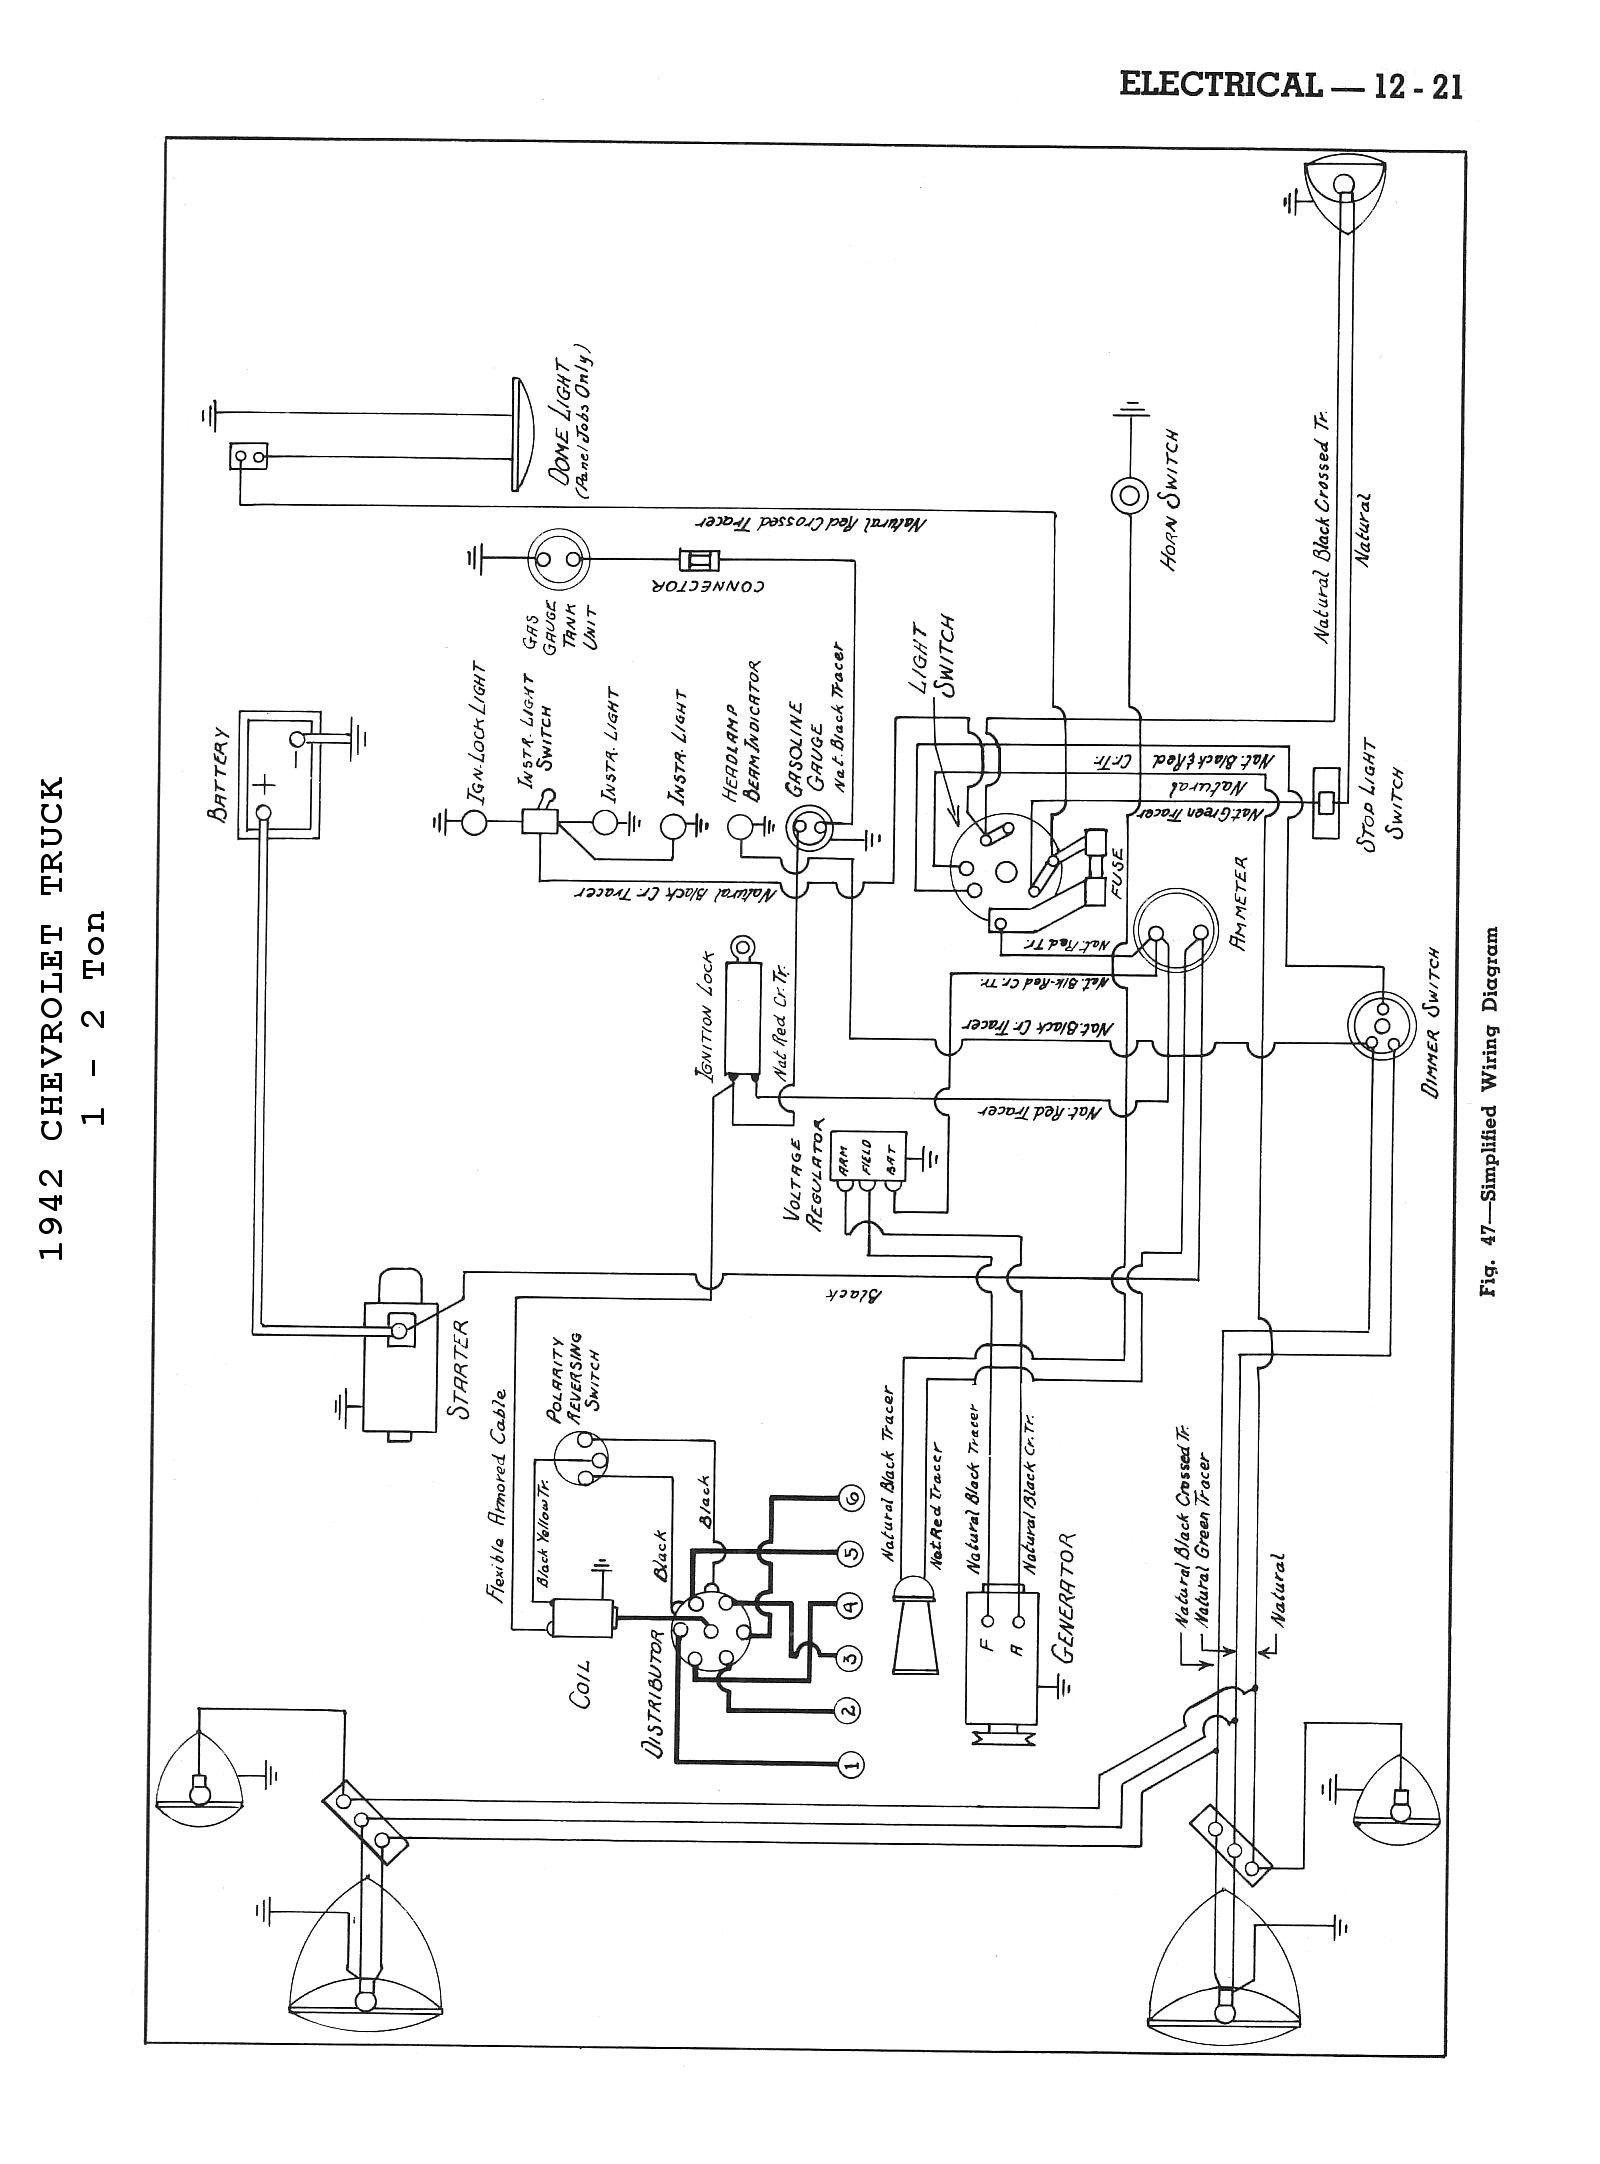 Suburban Rv Water Heater Parts Diagram : suburban, water, heater, parts, diagram, Wiring, Diagram, Inspirational, Denso, Alternator,, Diagram,, Alternator